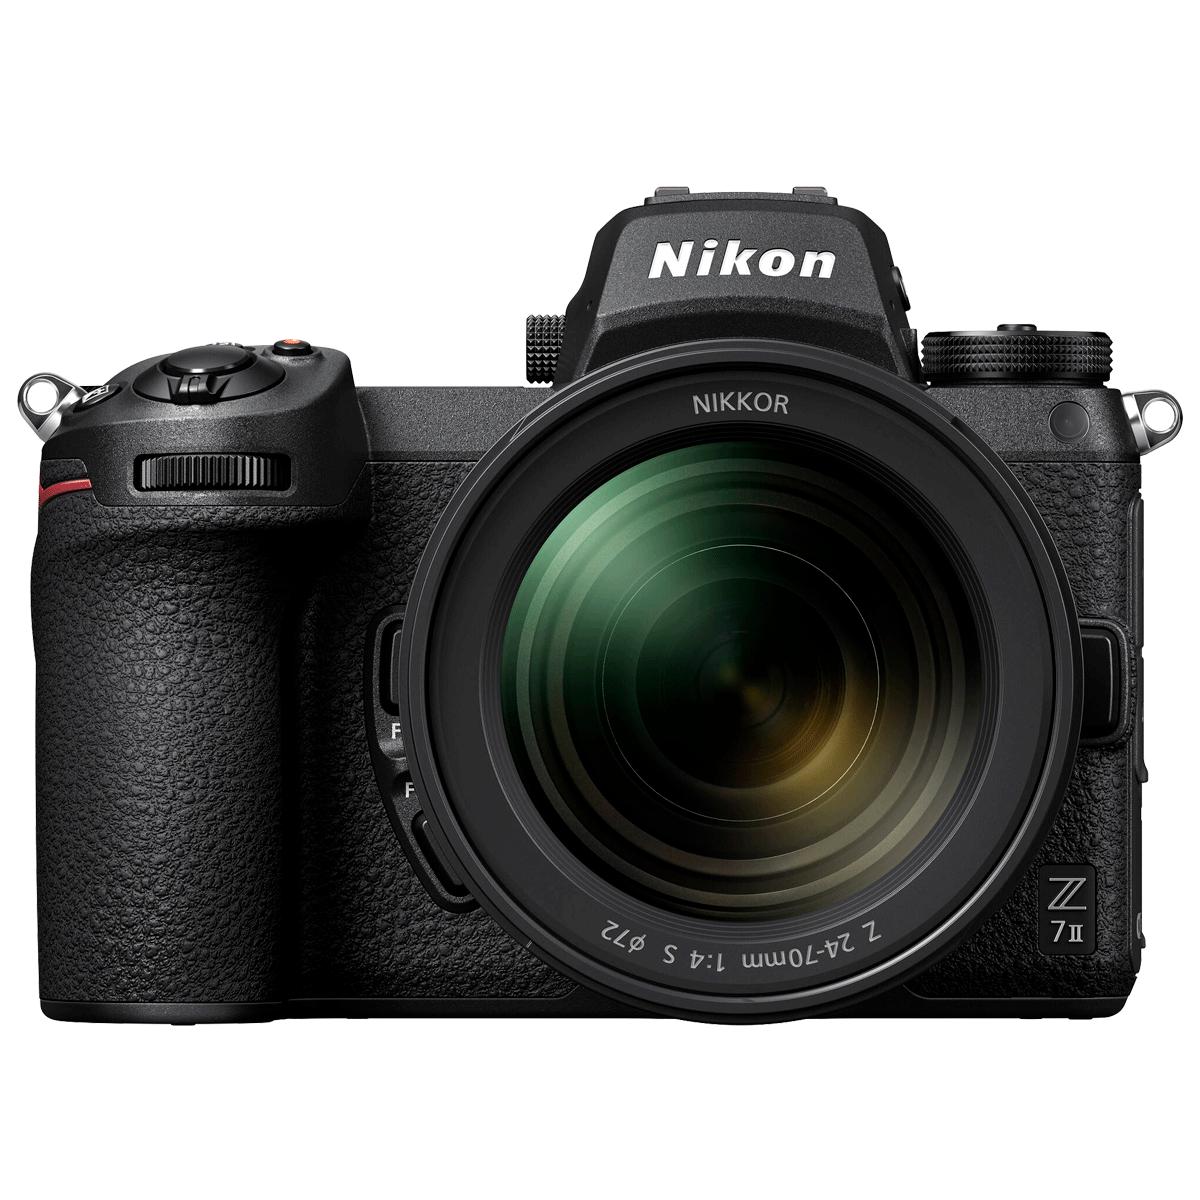 Nikon Z 7II 45.7MP Mirrorless Camera (24-70mm Lens, Dust-Reduction System, VOK070XN, Black)_1